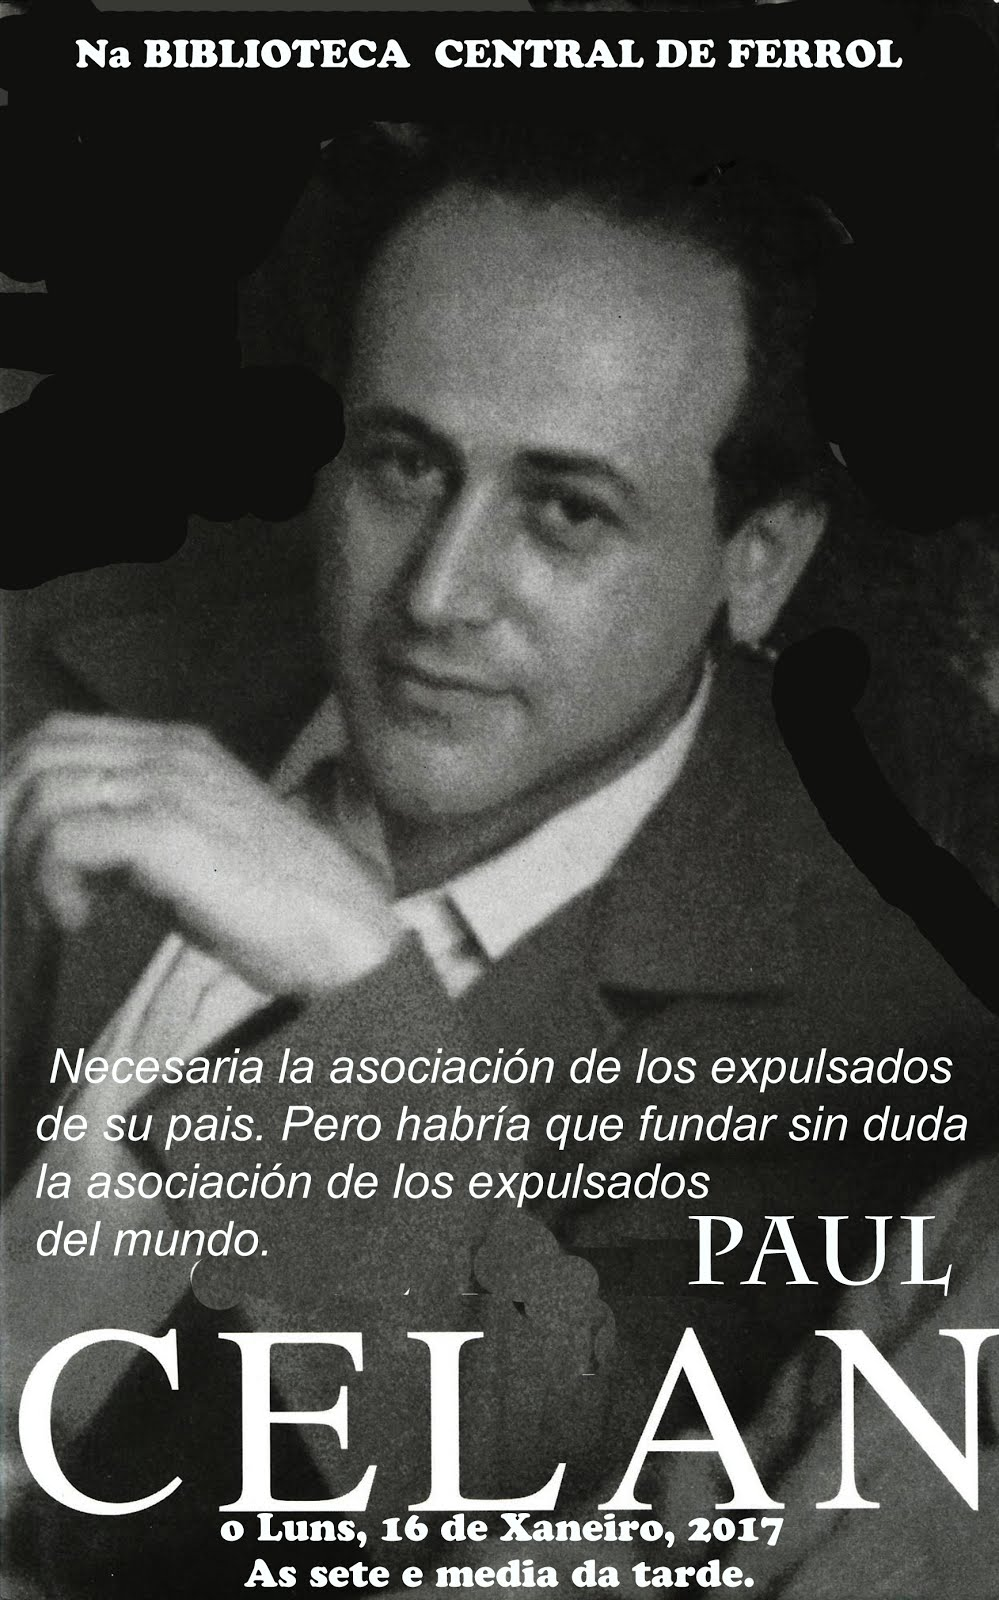 POEMAS DE PAUL CELAN